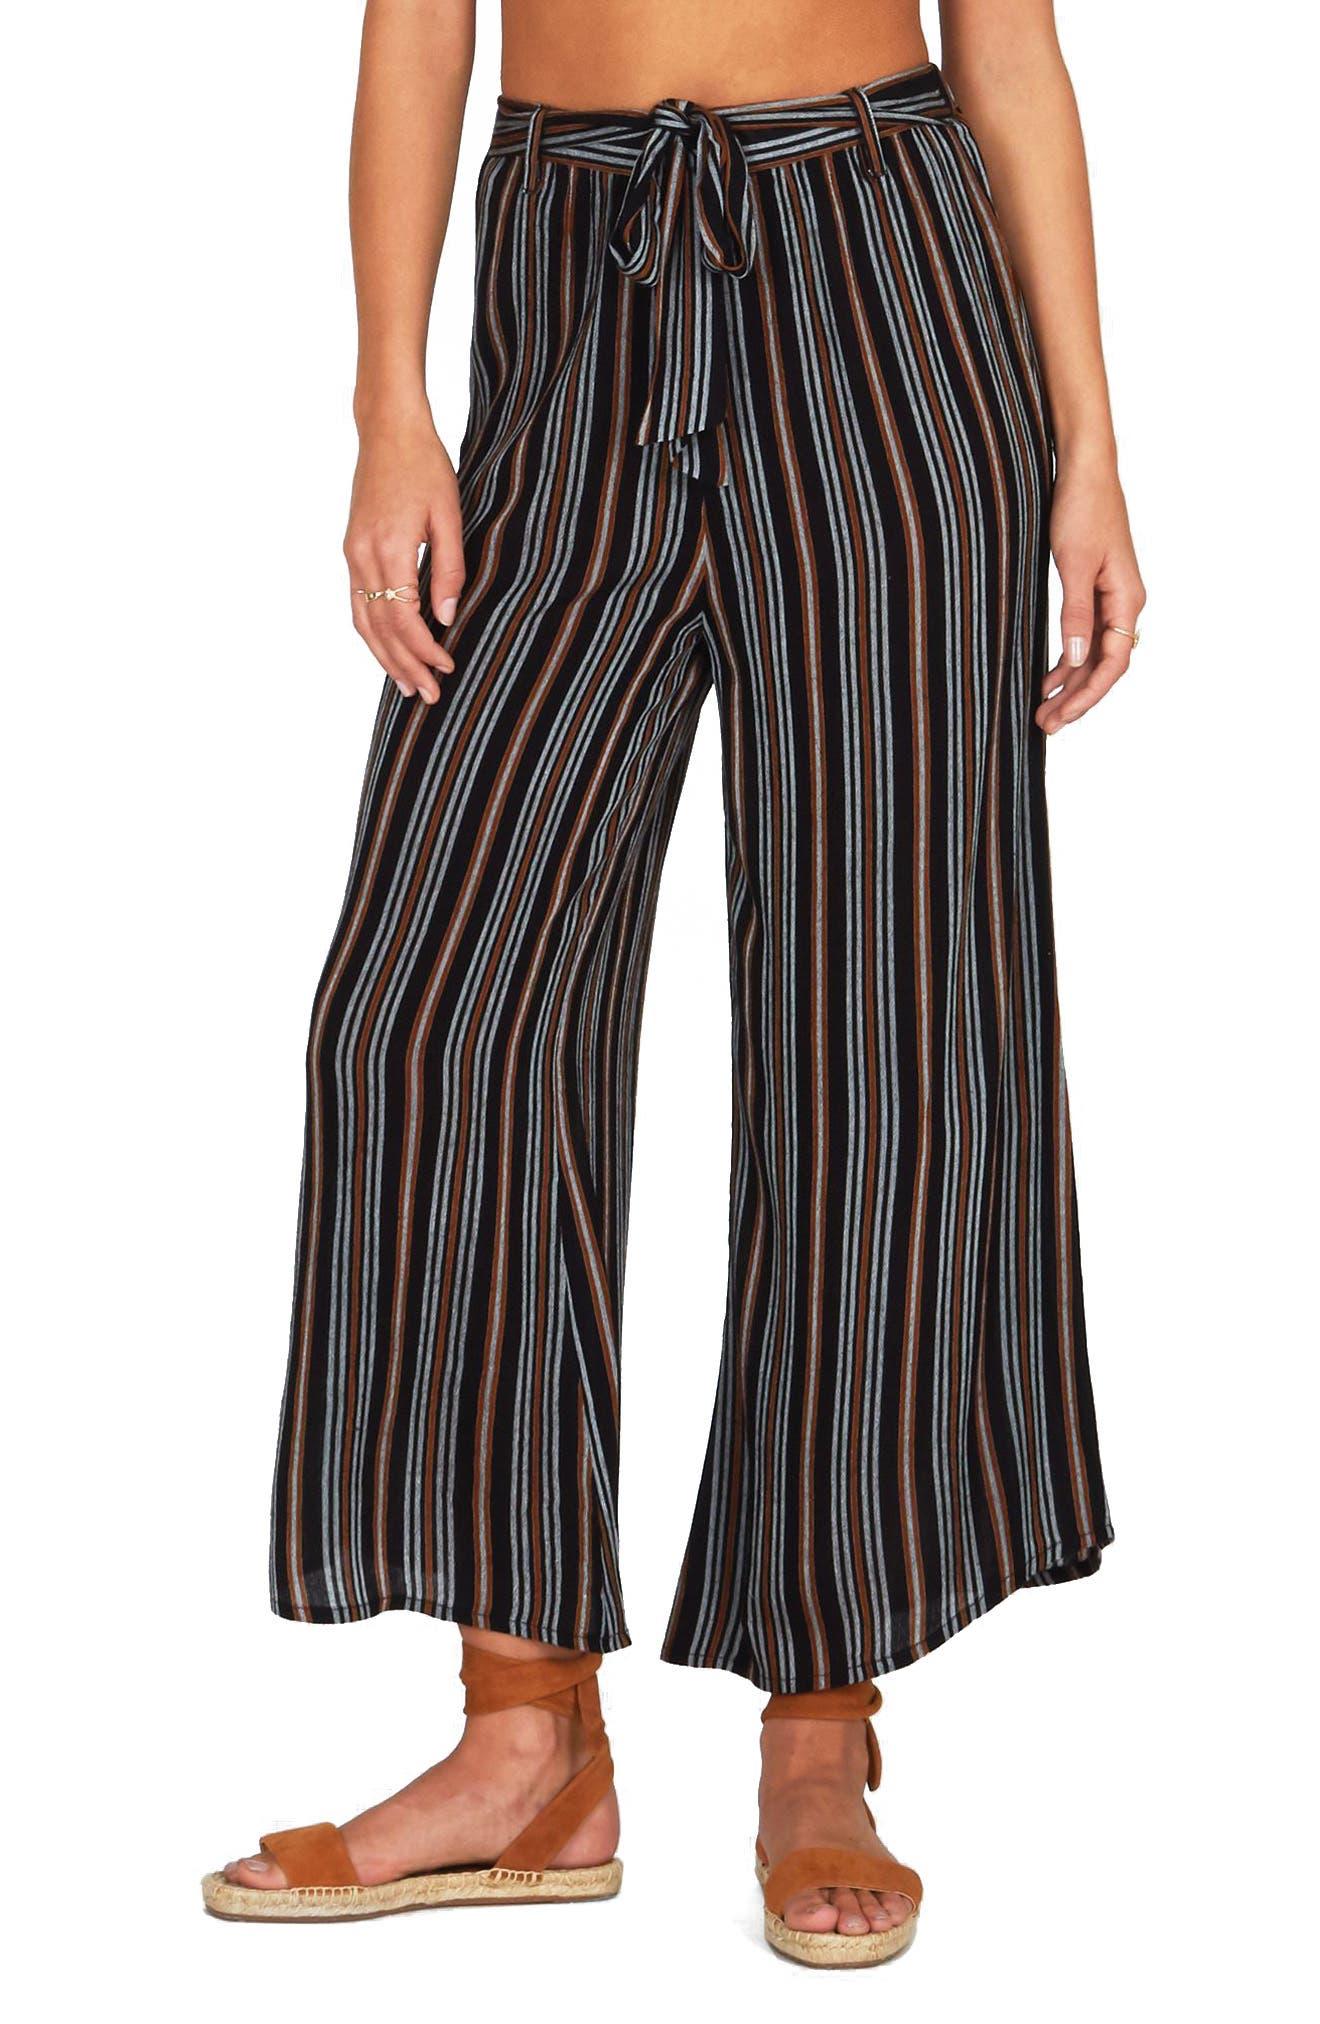 Even Tides Stripe Pants,                             Main thumbnail 1, color,                             Black